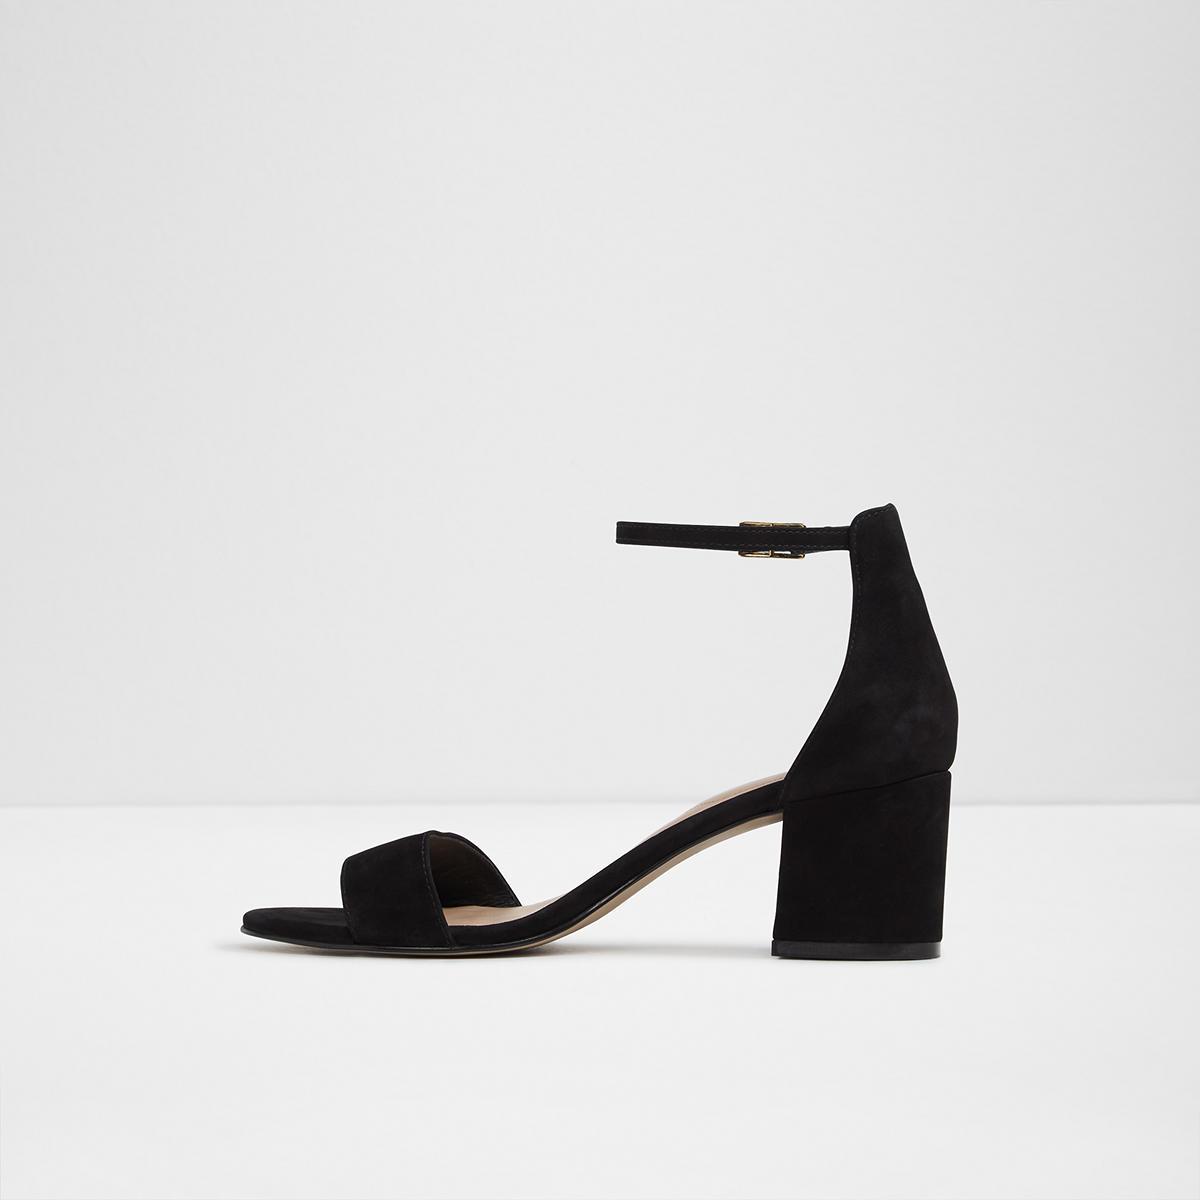 cc3289904db Villarosaw Black Nubuck Women s Low-mid heels